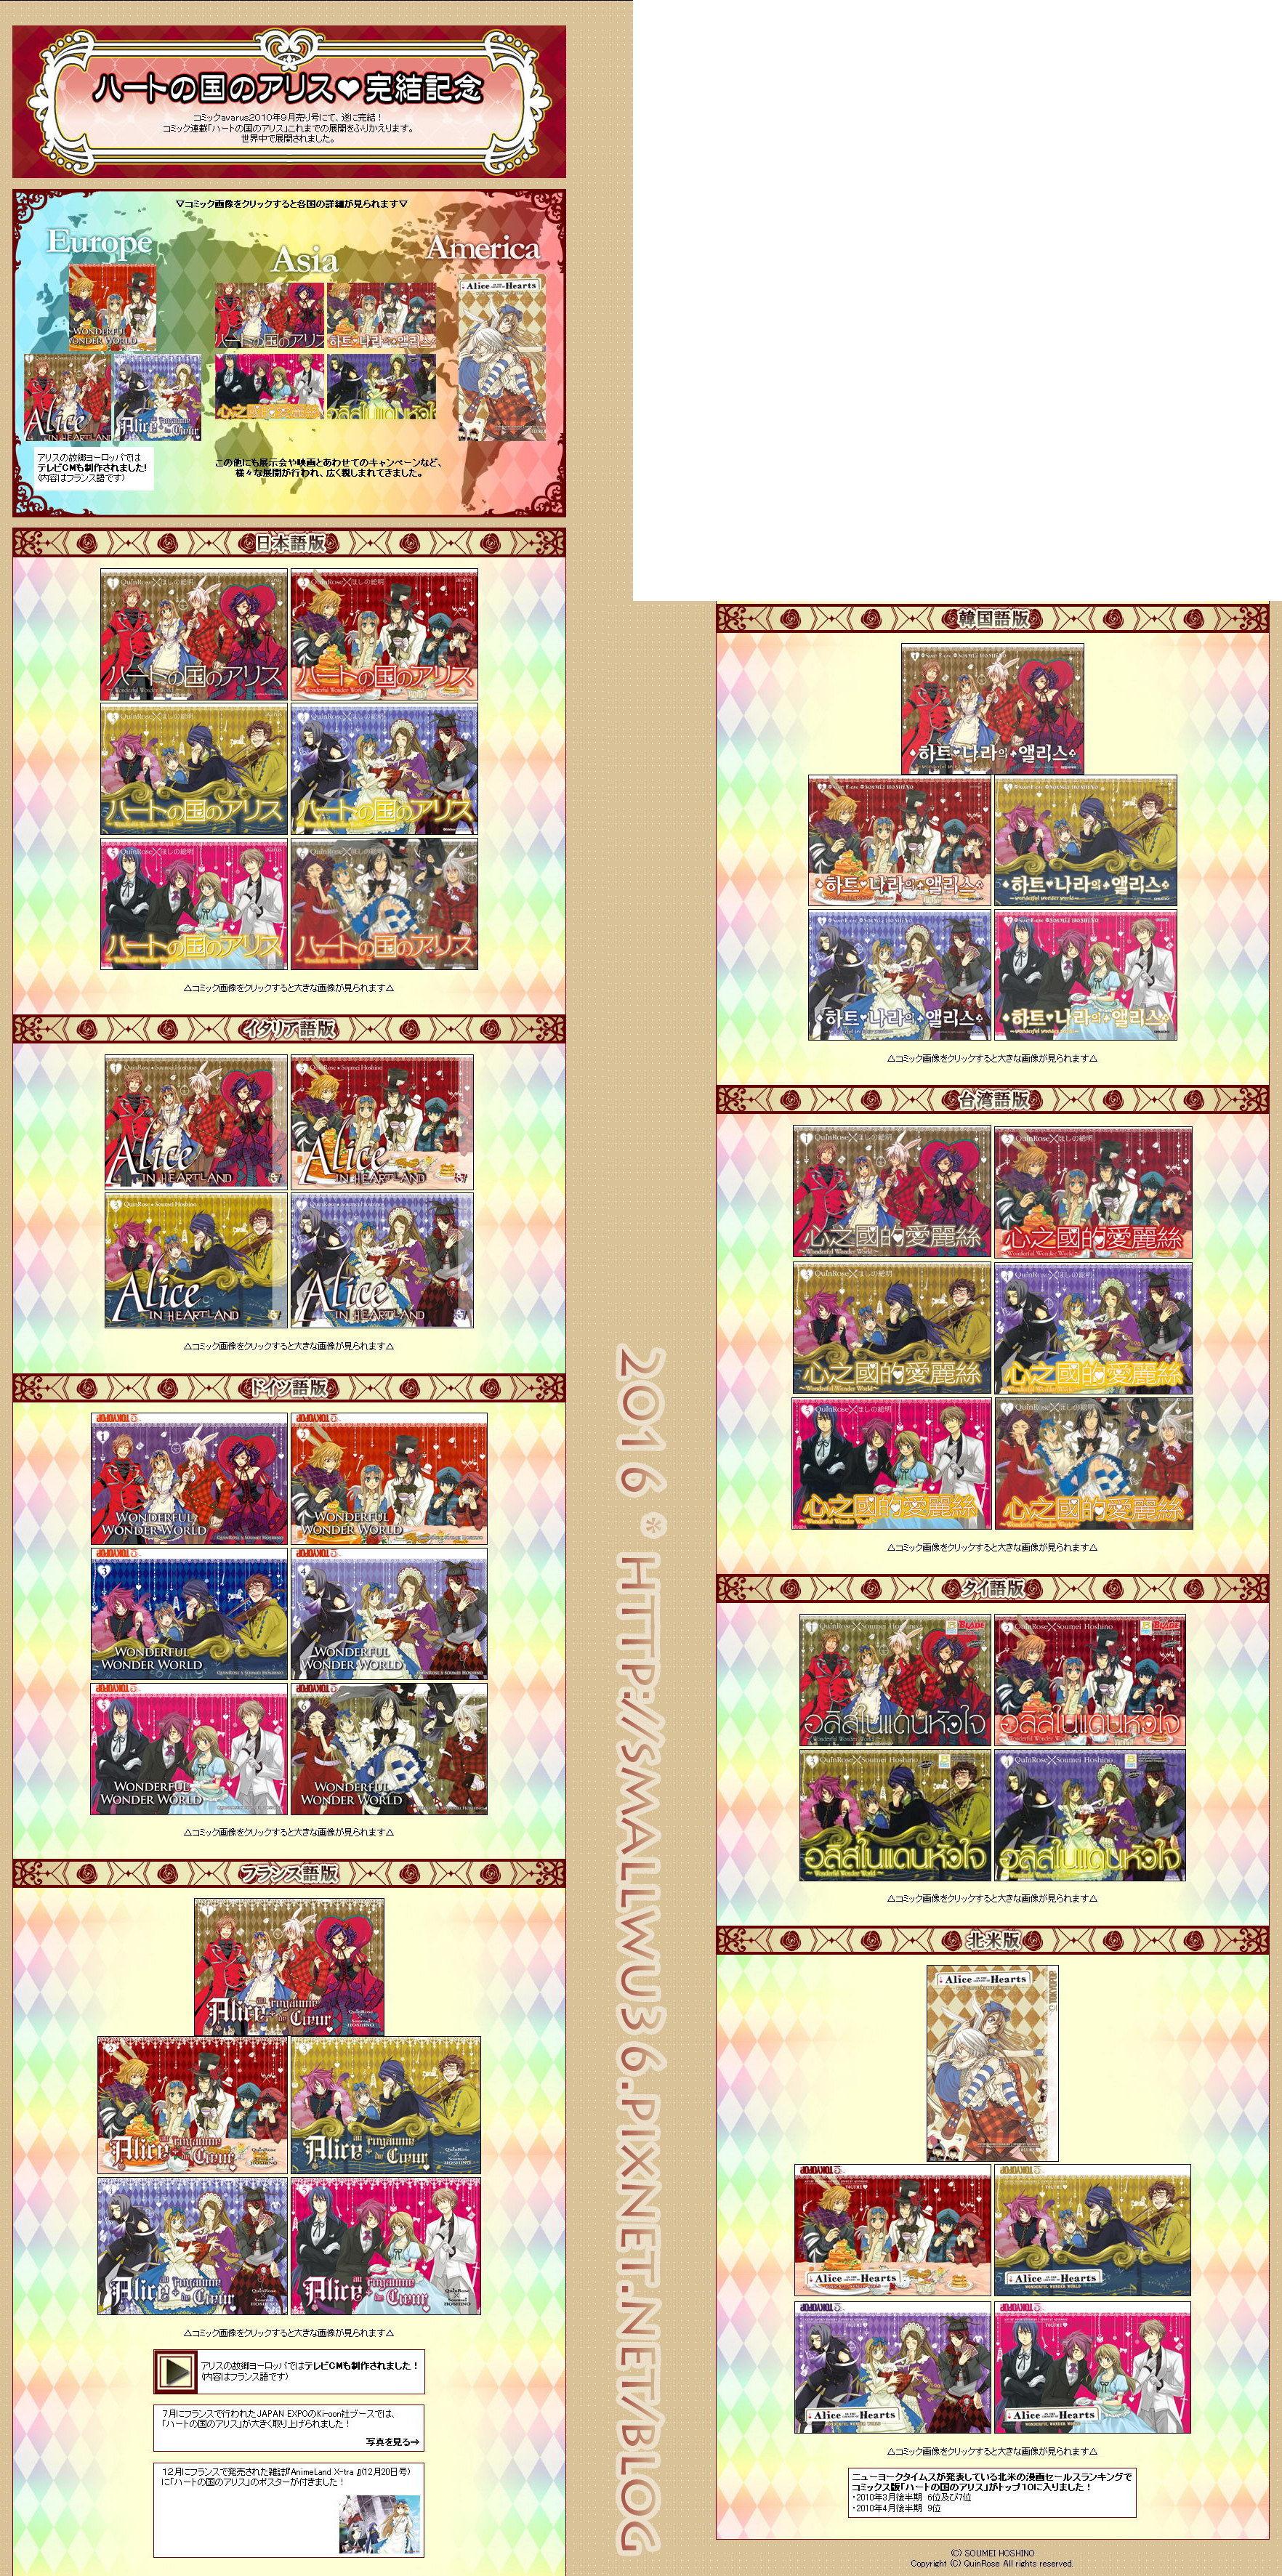 QR官網-各語言版本的心之國的愛麗絲漫畫-s-2.jpg